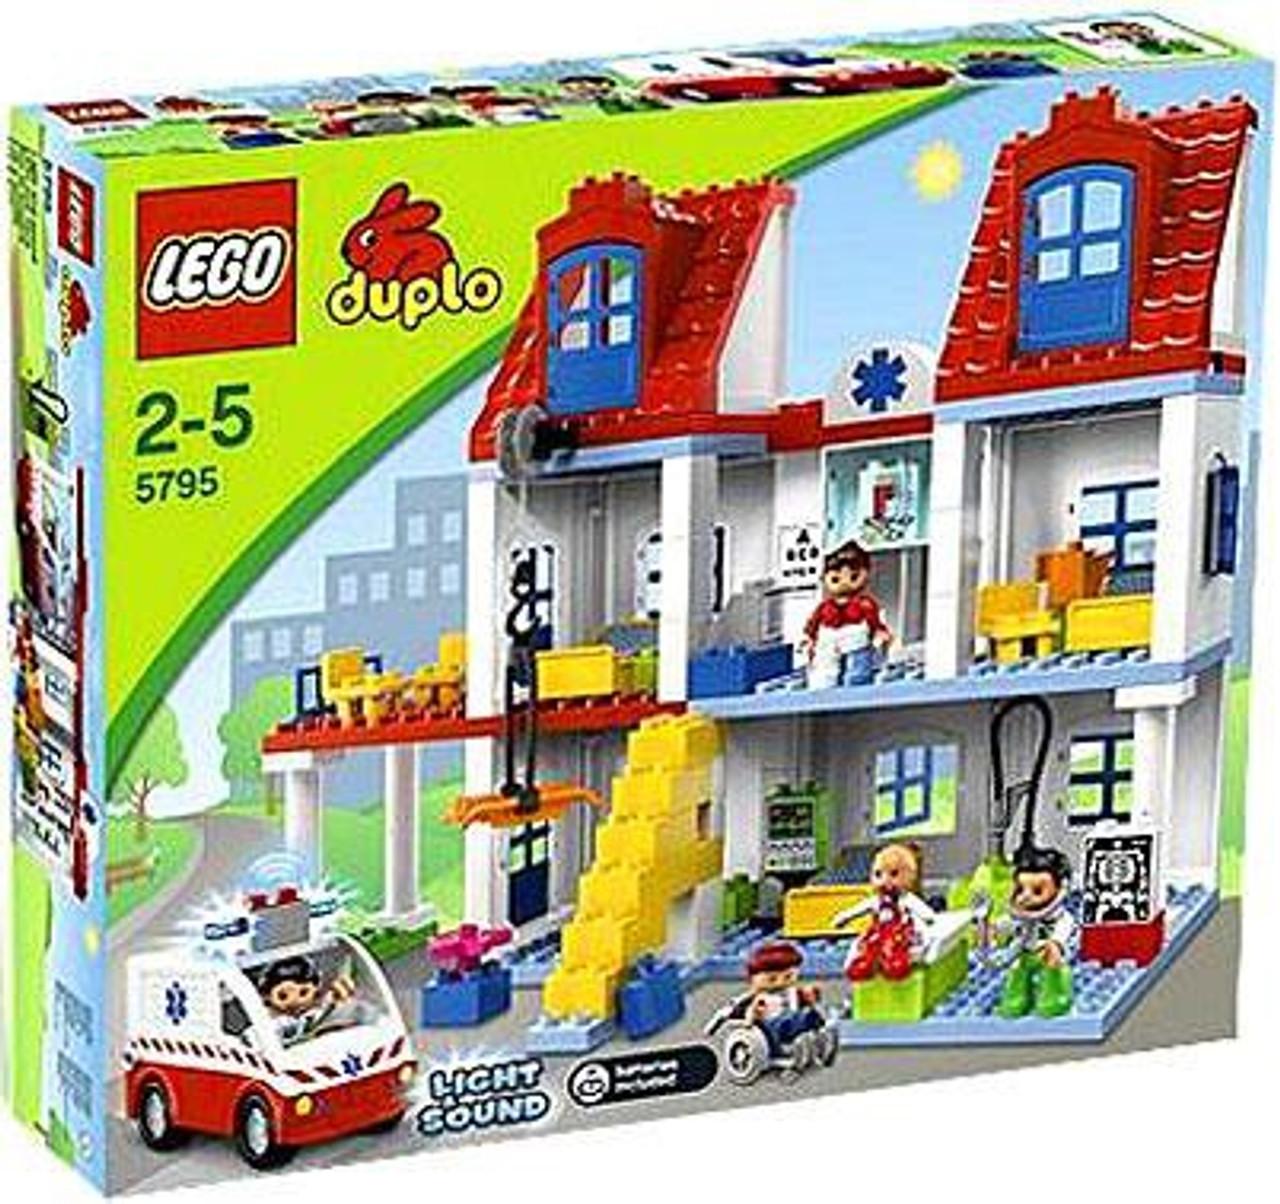 LEGO Duplo Big City Hospital Set #5795